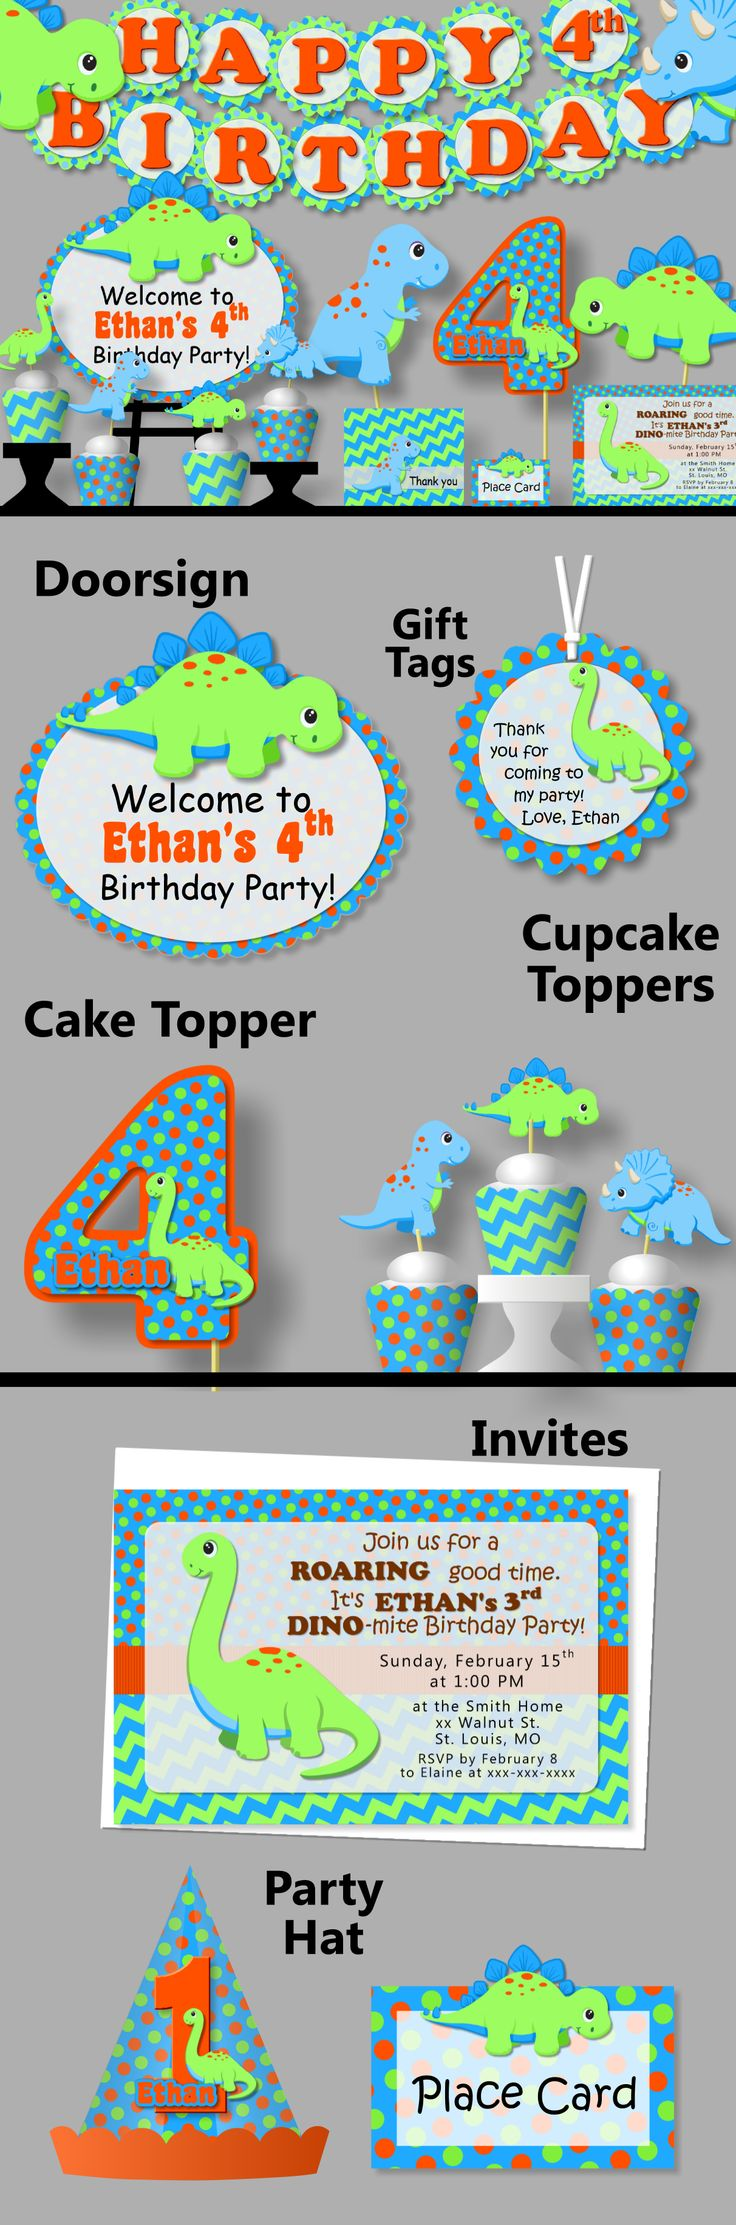 Dinosaur Party Decorations, Dinosaur Birthday Invitation - Party Supplies, Party Favor, Banner, Cake Topper, Cupcake, blue, green orange #bcpaperdesigns